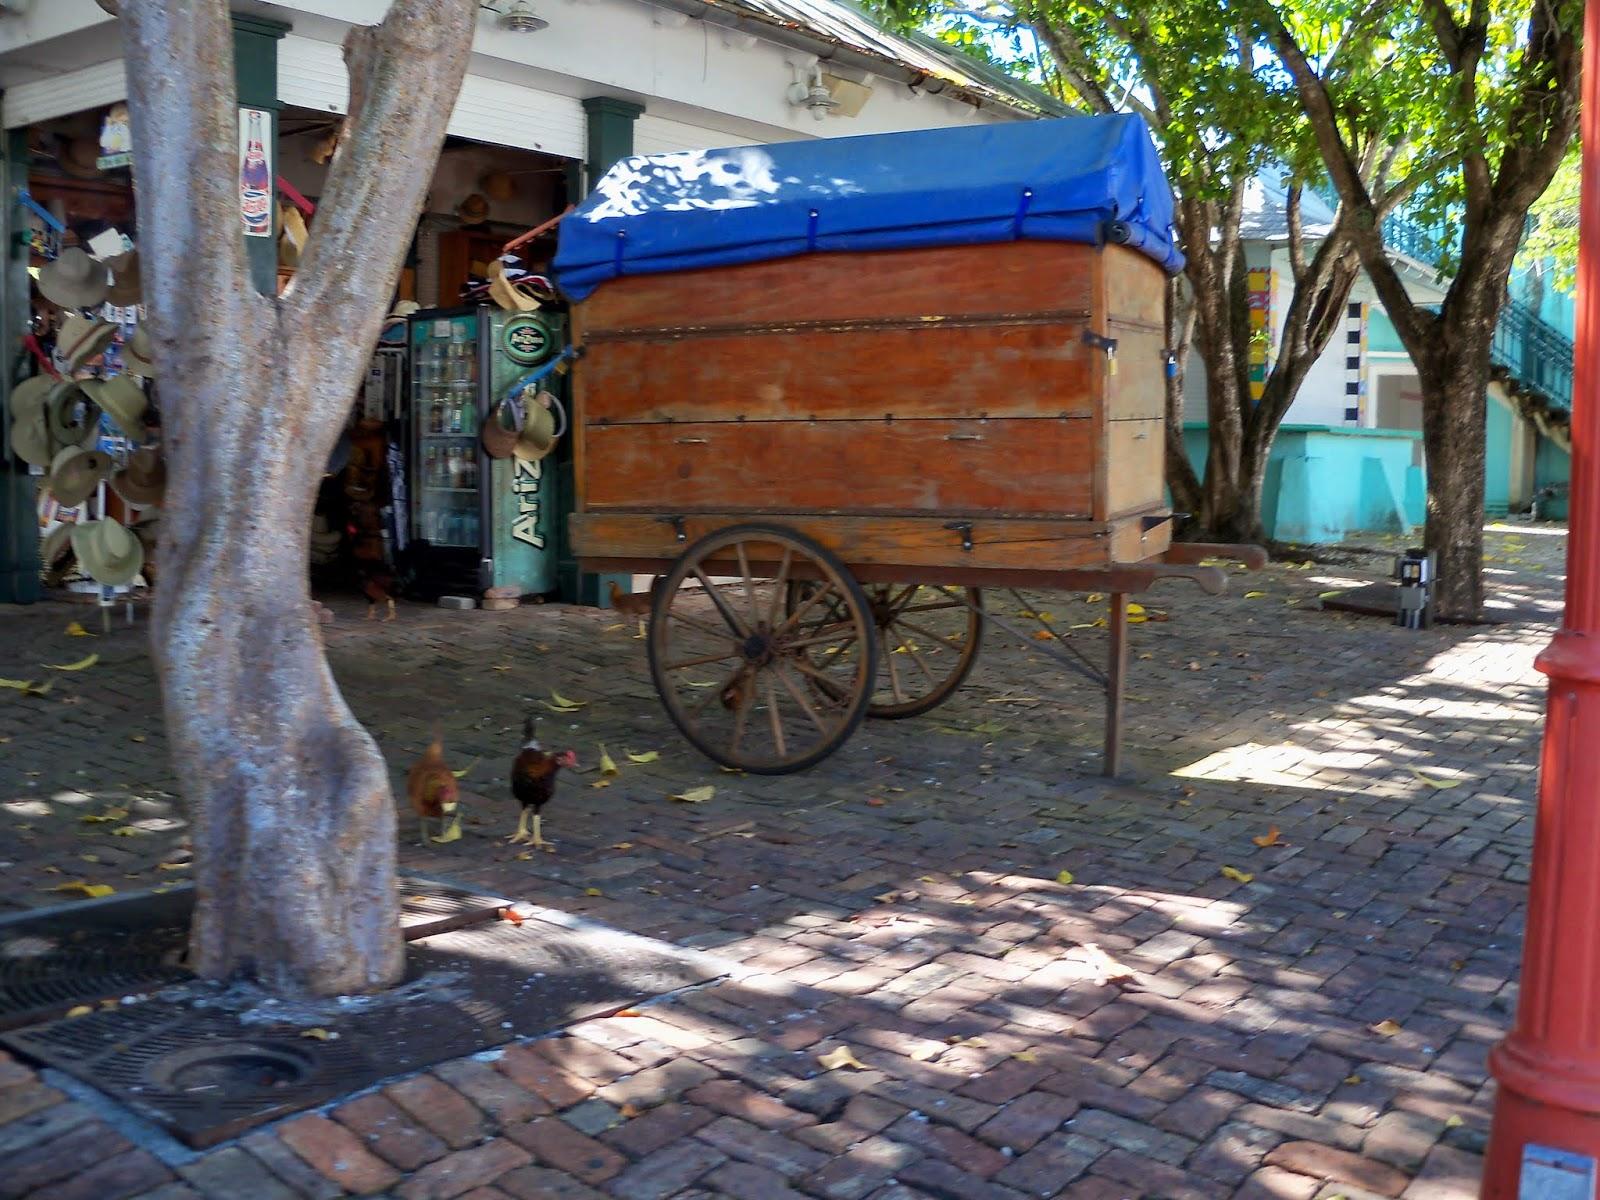 Key West Vacation - 116_5469.JPG